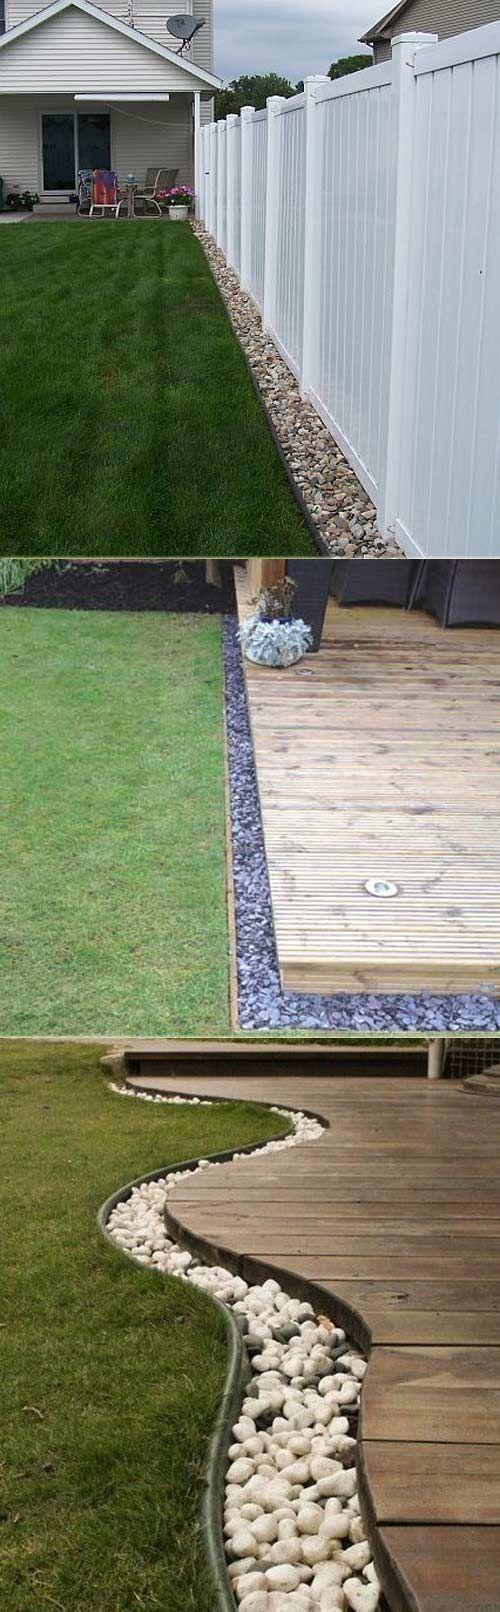 Rocks or Pebbles Used As Simple Clean Edging Of A Deck #LandscapingEdging